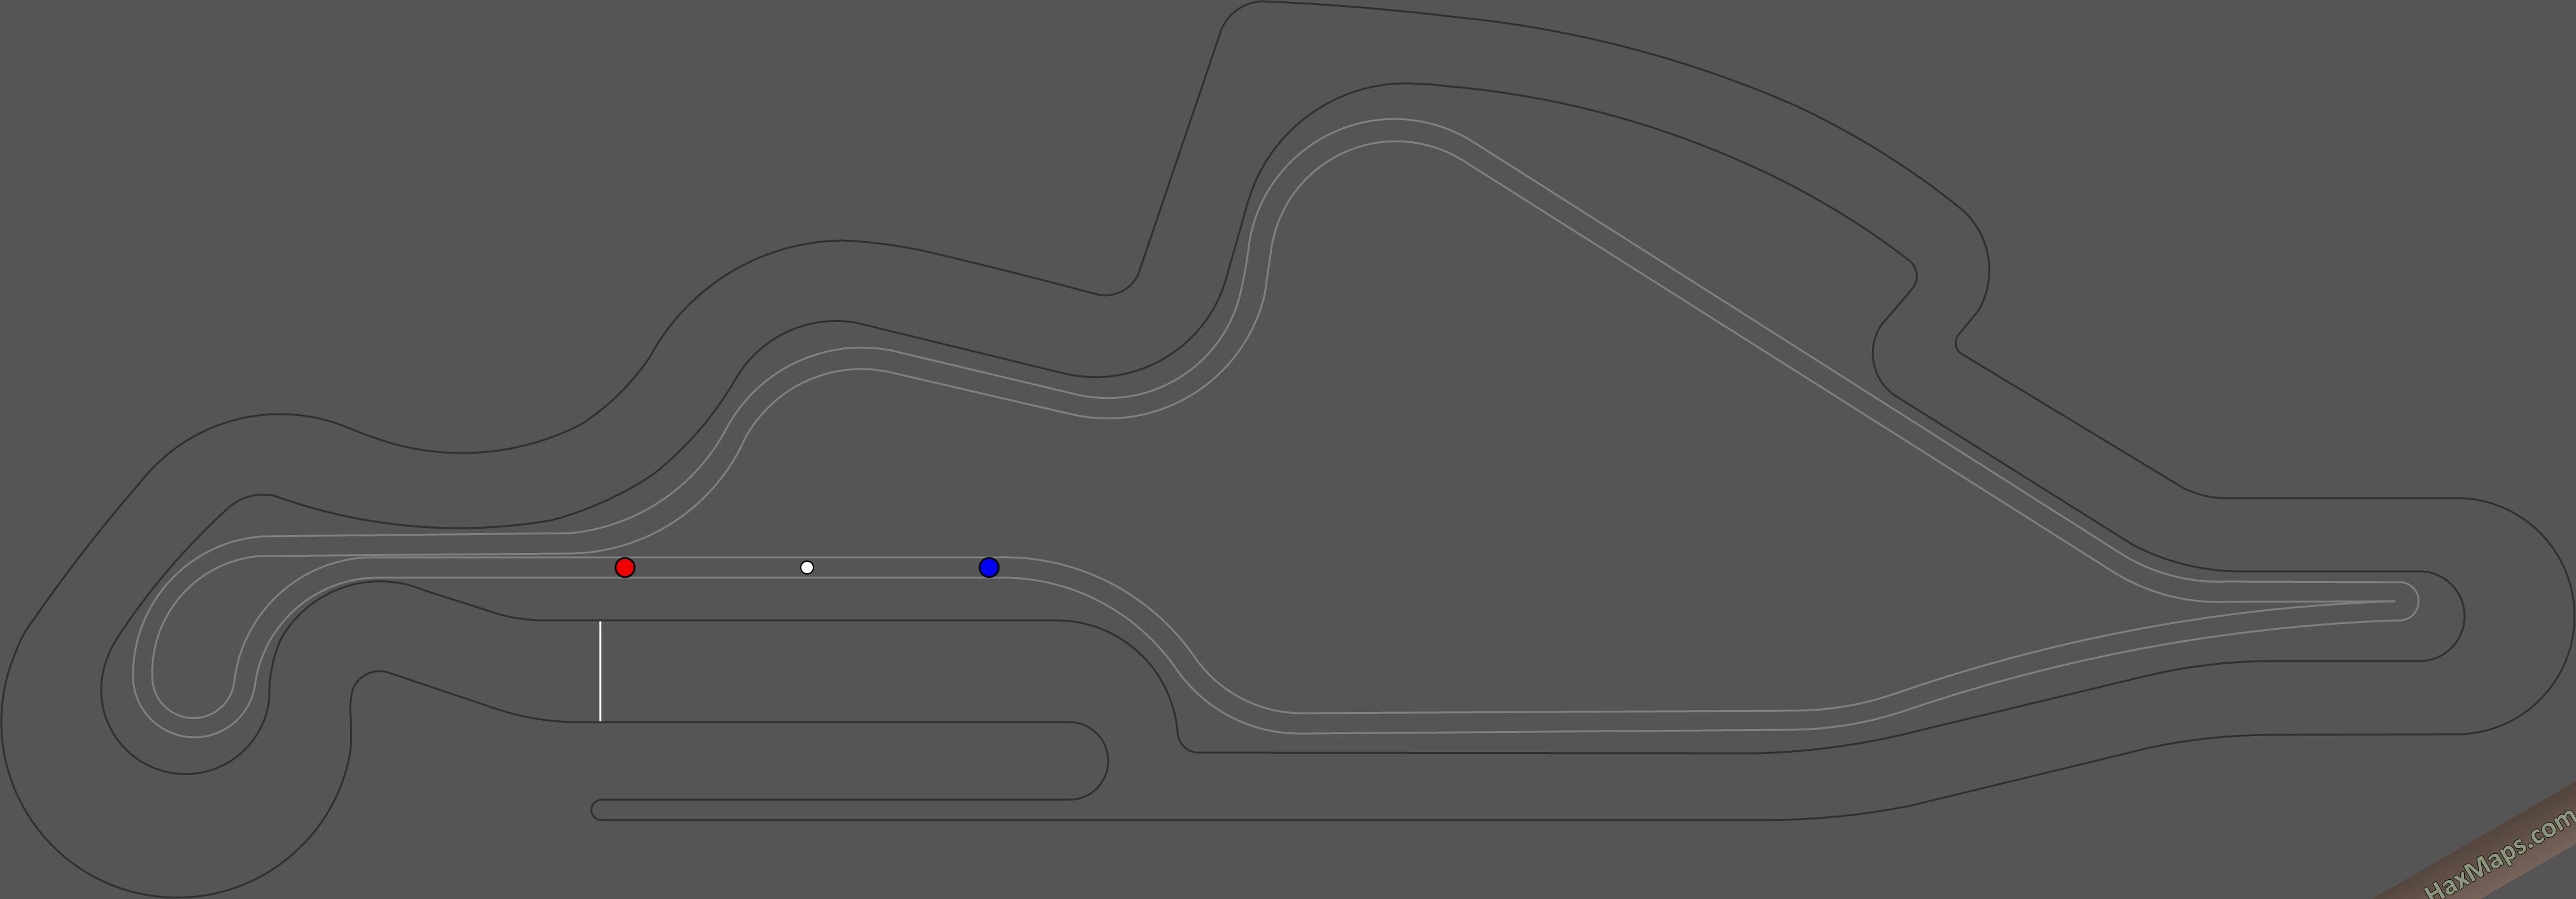 hax ball maps   Q Canada F1 Circuit Gilles Villeneuve